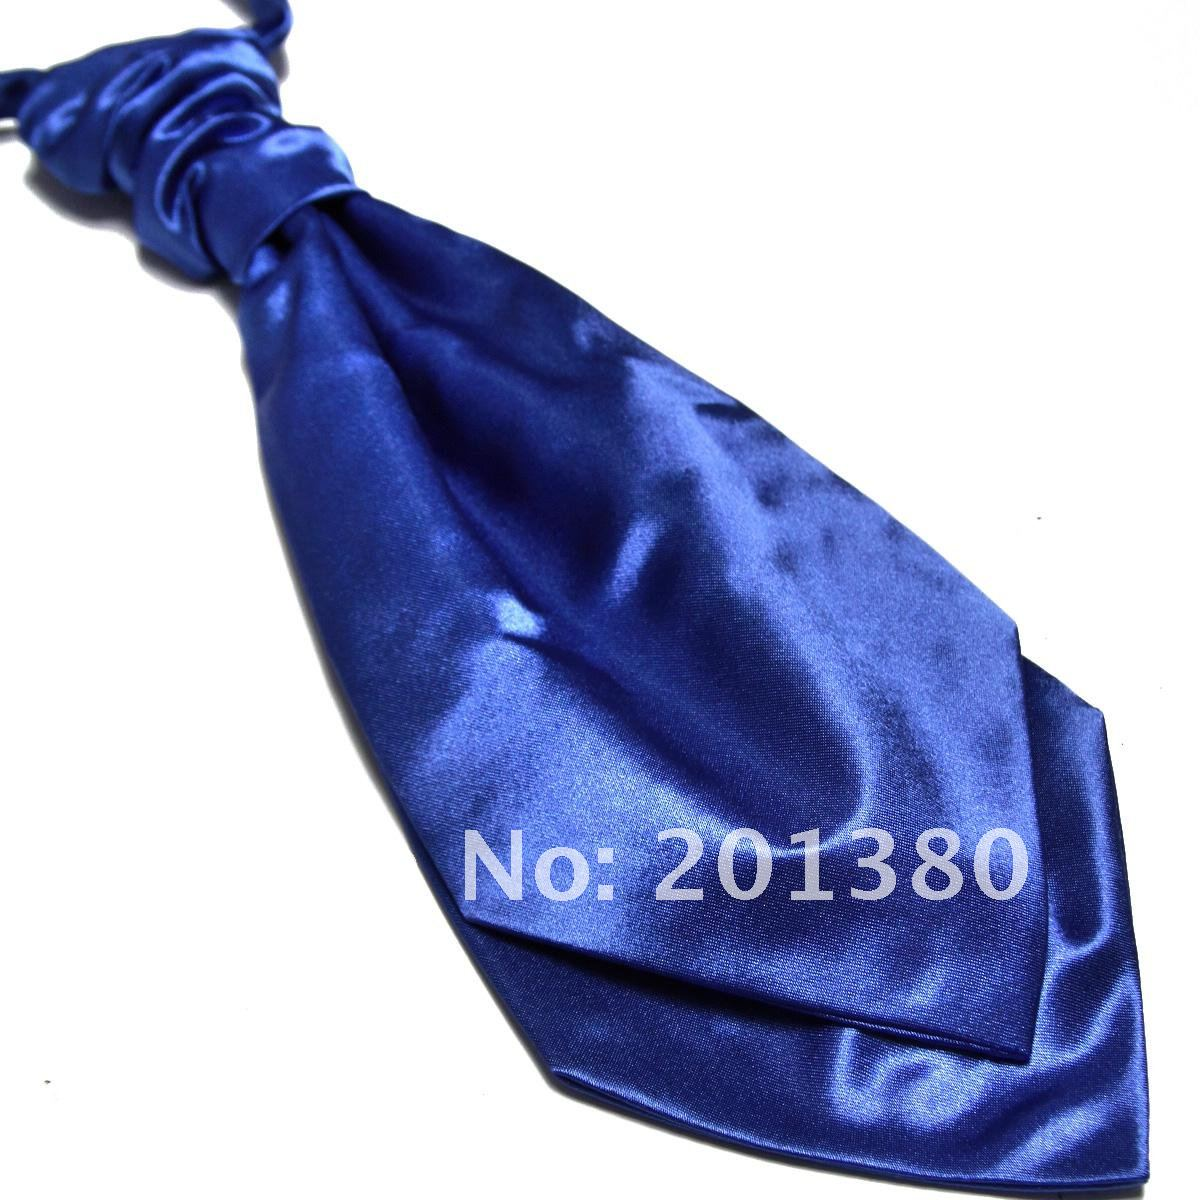 2019 Ties For Men Cravat Solid Color Necktie Ascot Wedding Copy Silk Solid Color Fashion Polyester Gravata Tie